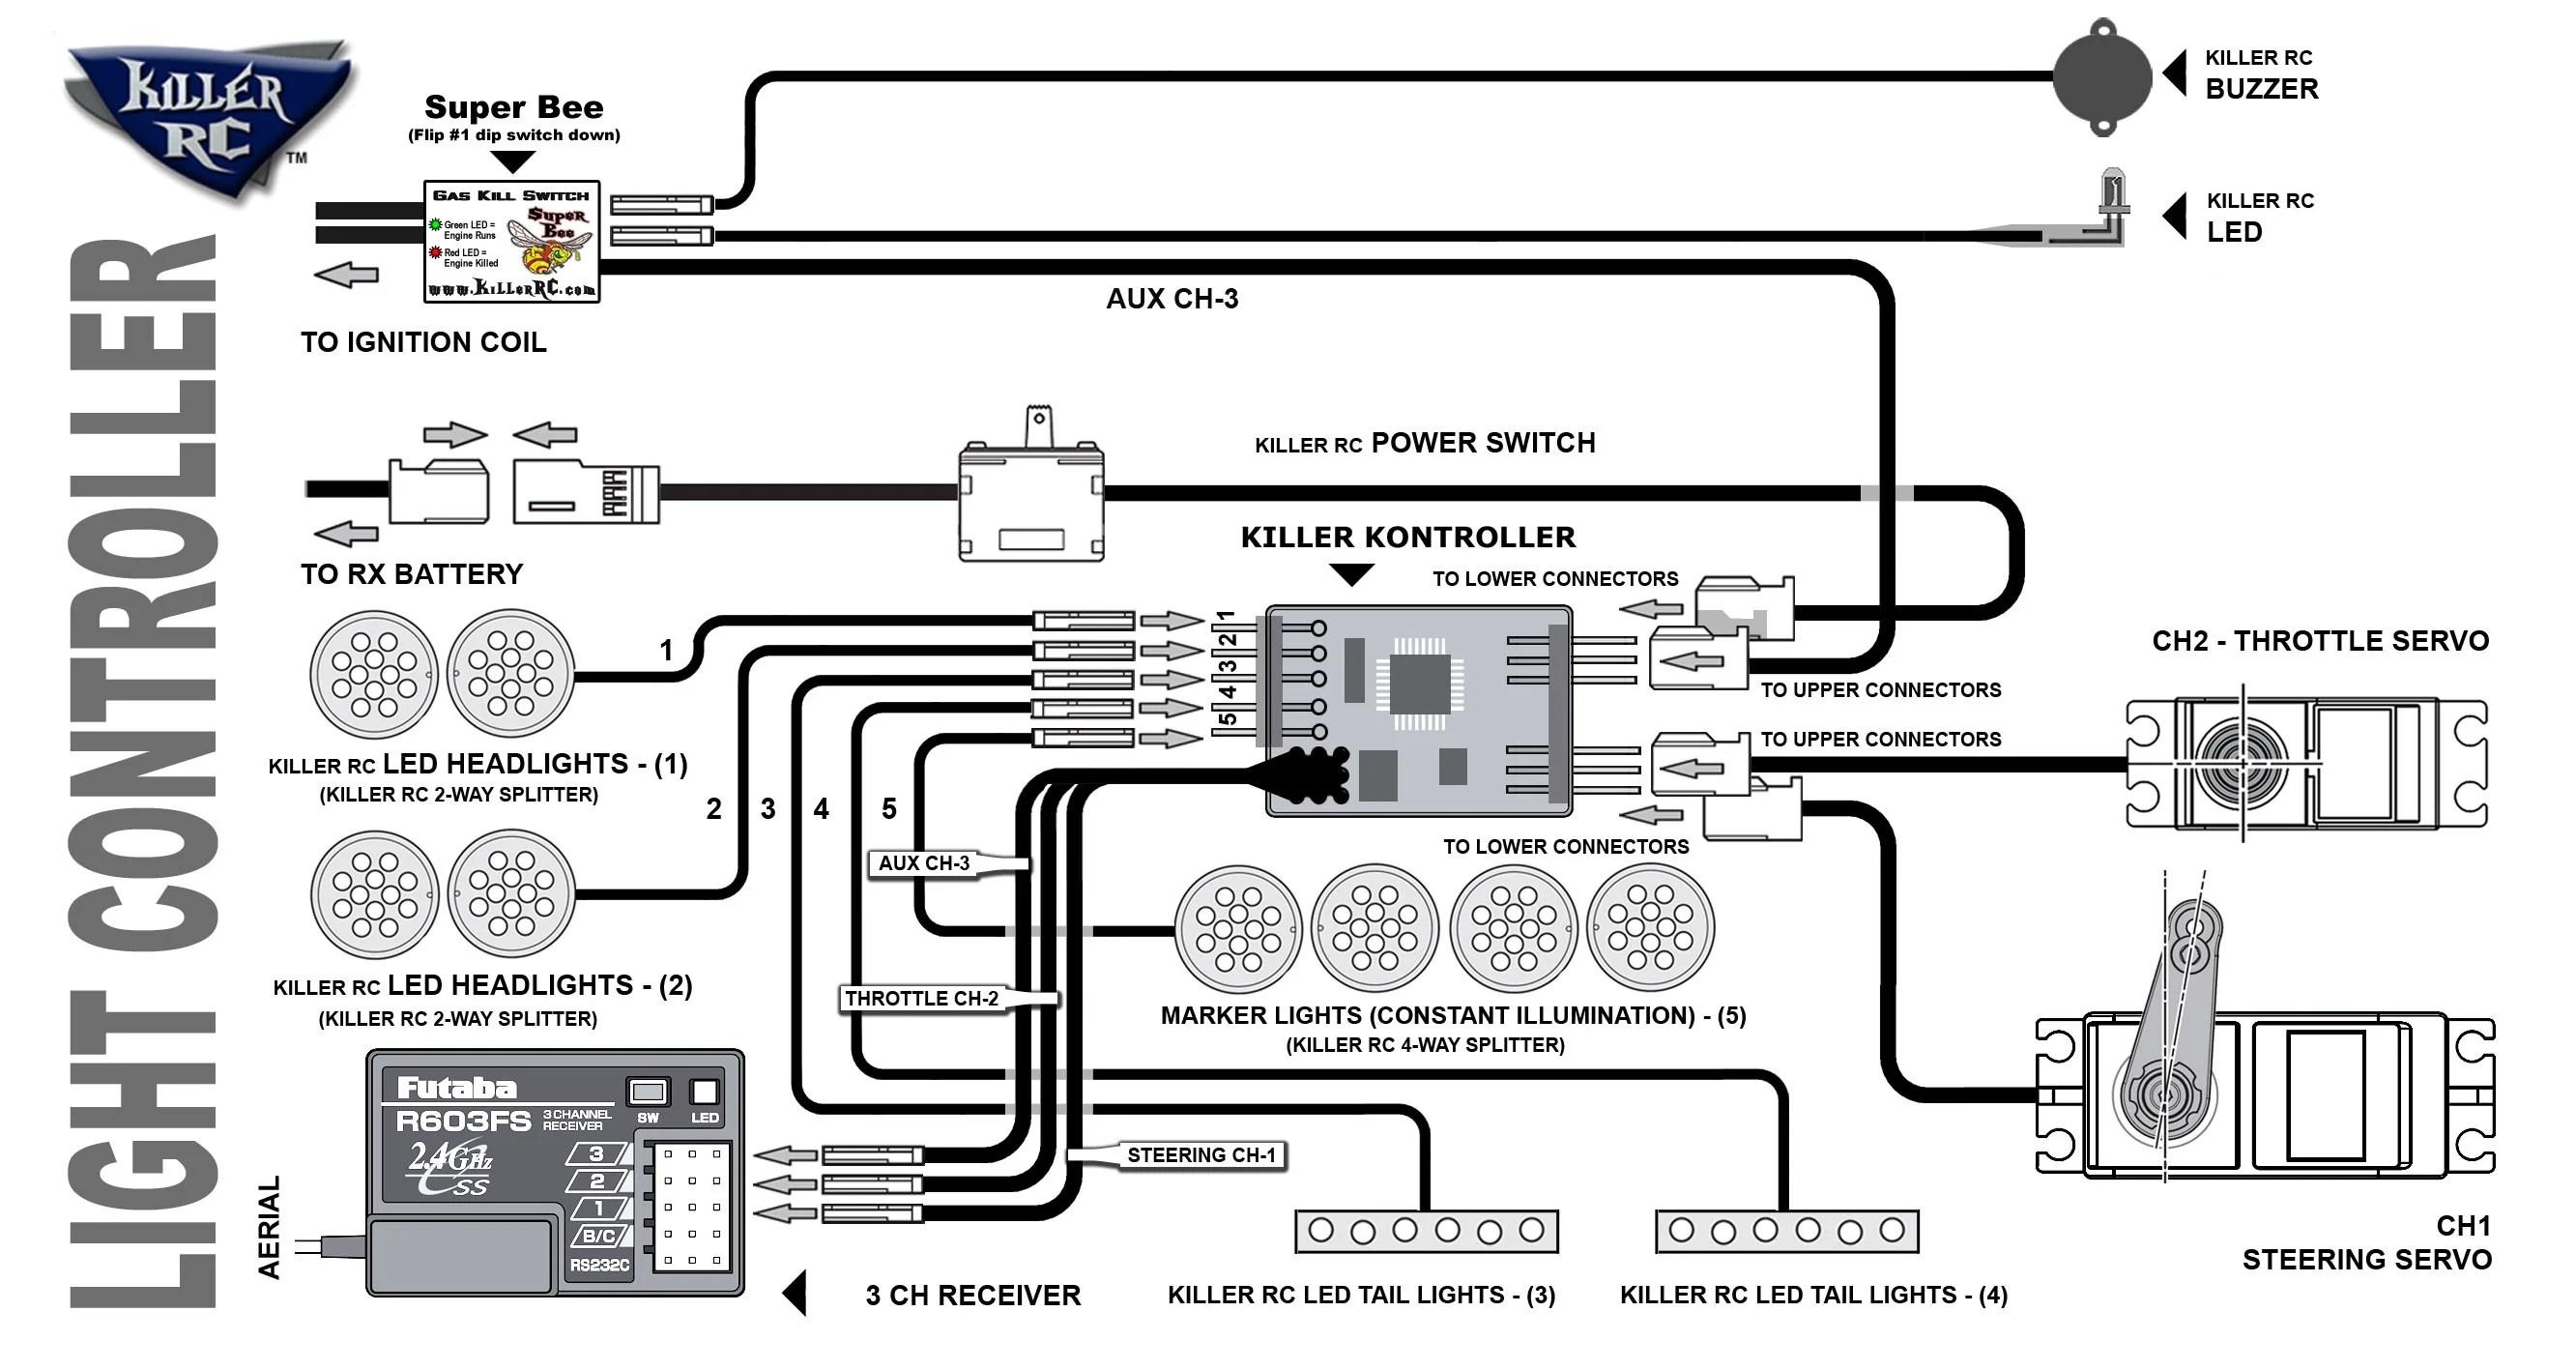 small resolution of light controller diagram killer controller v3 3 channel configuration